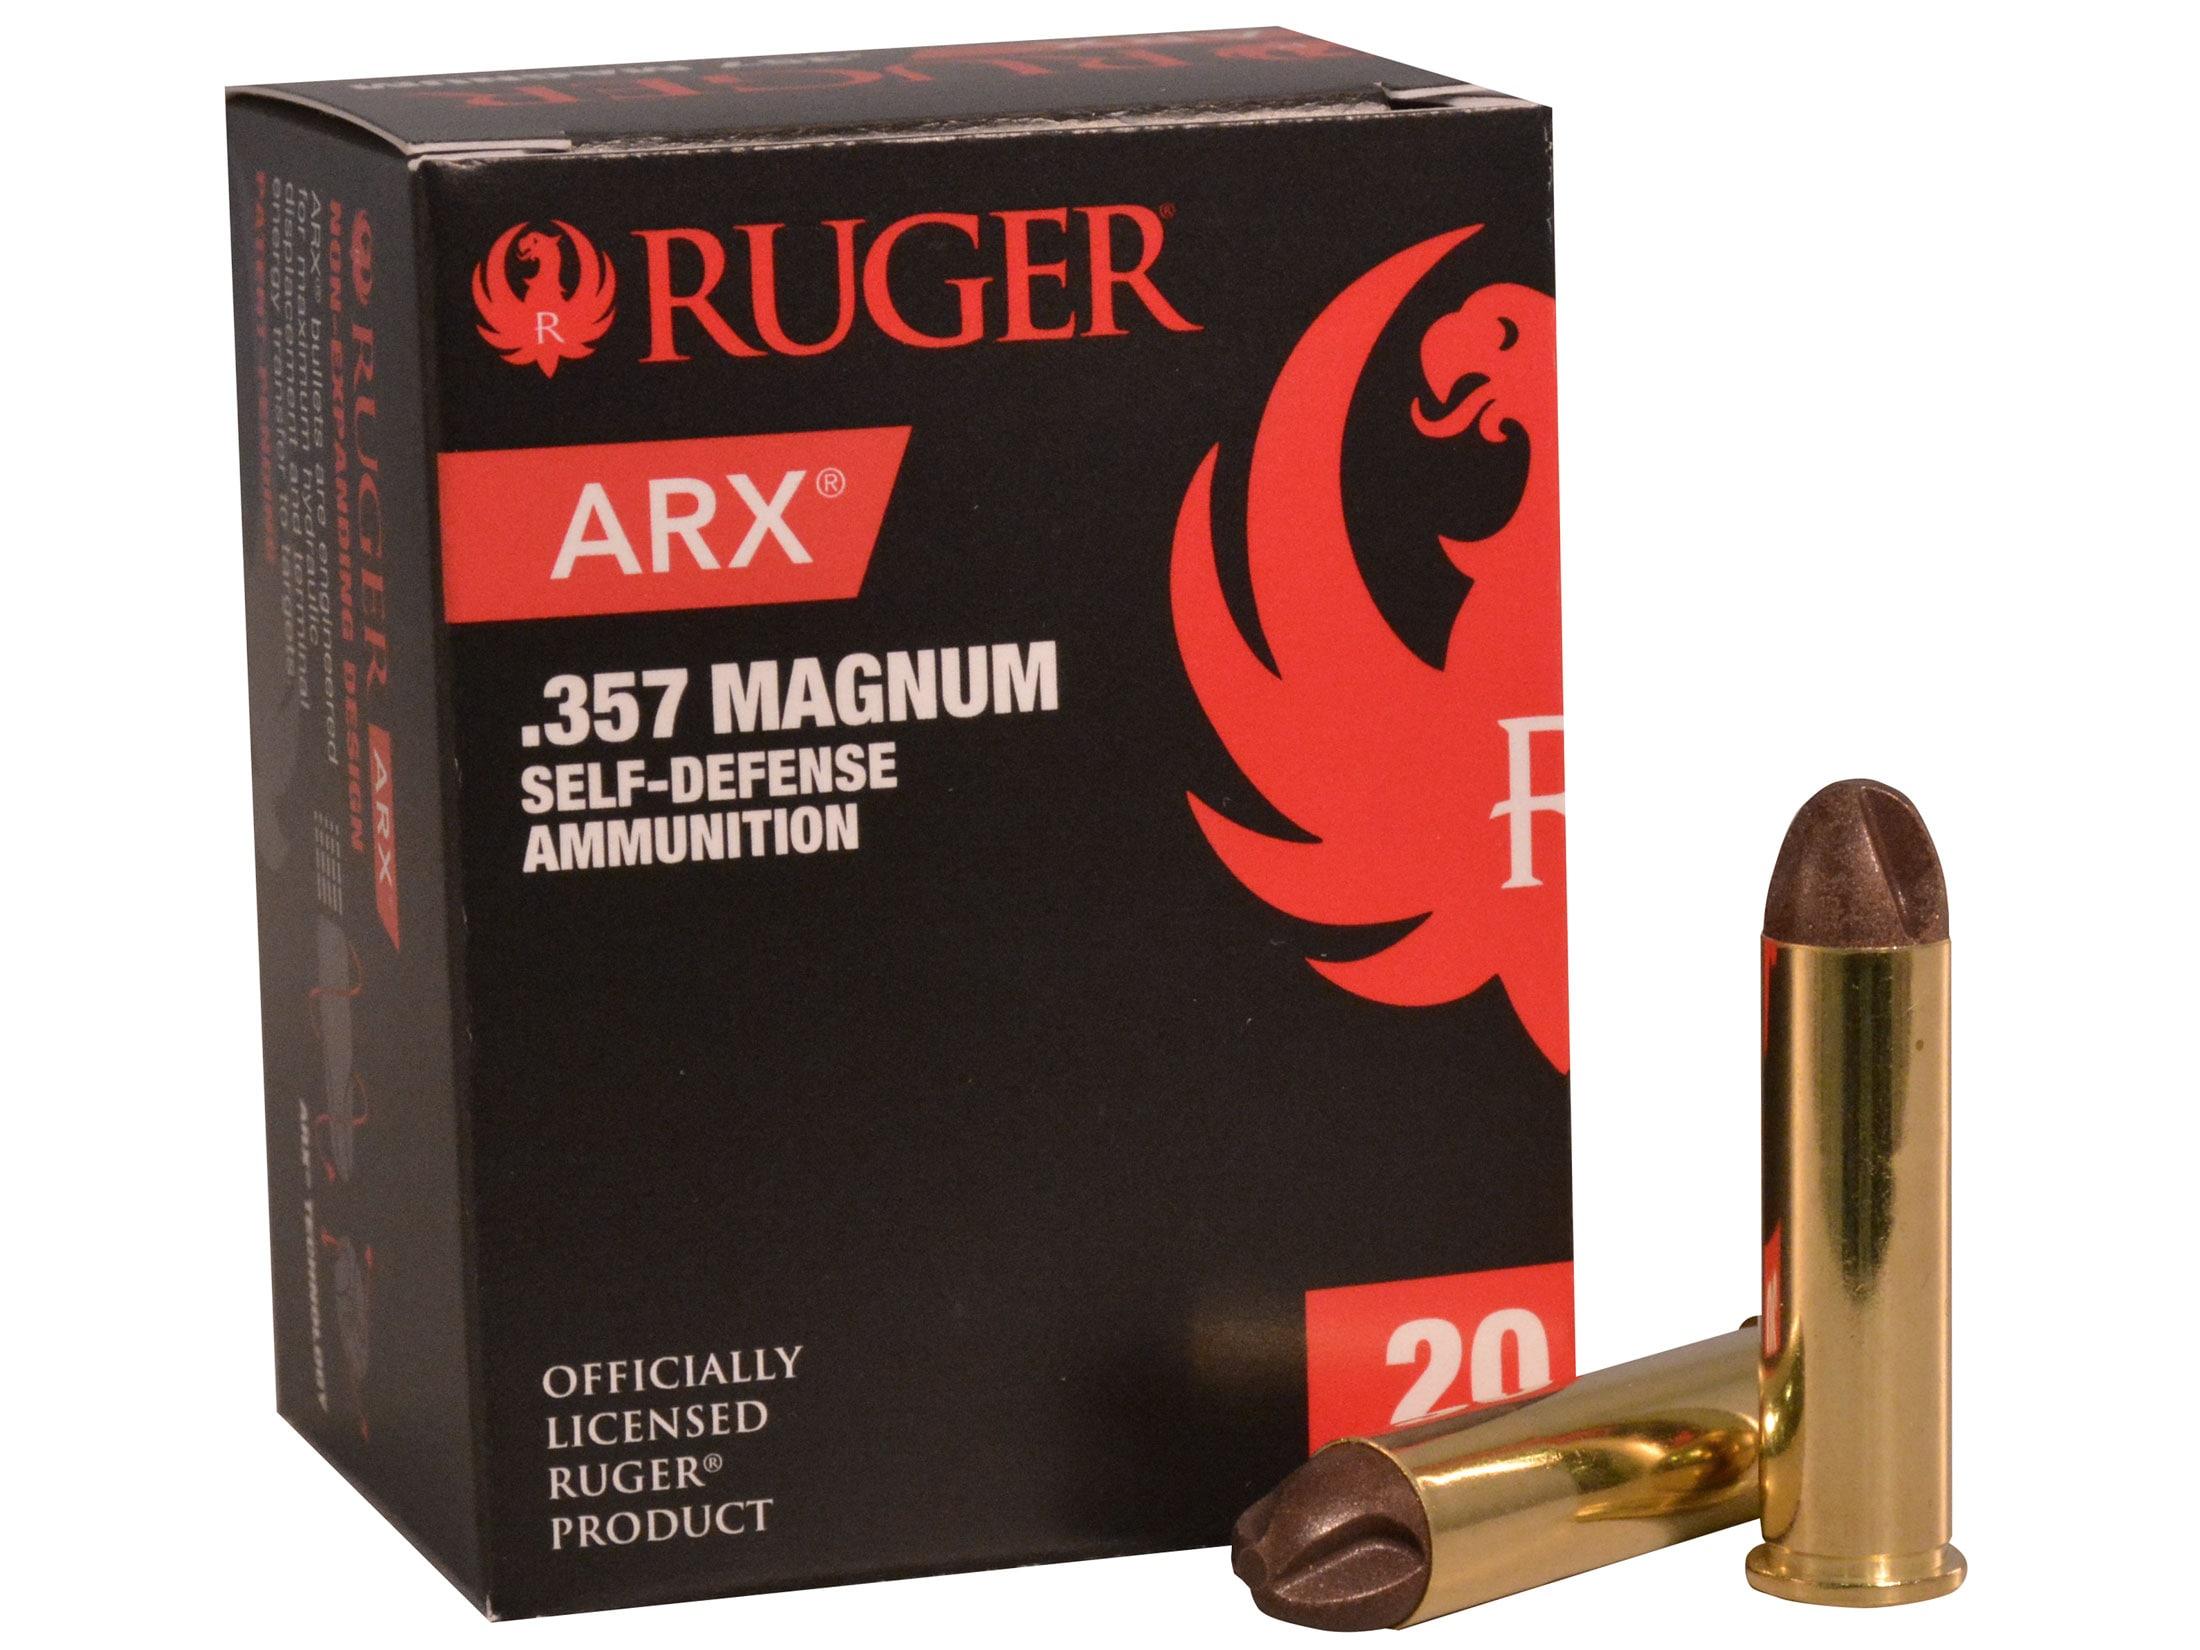 Ruger Self Defense Ammo 357 Mag 86 Grain Frangible PolyCase ARX